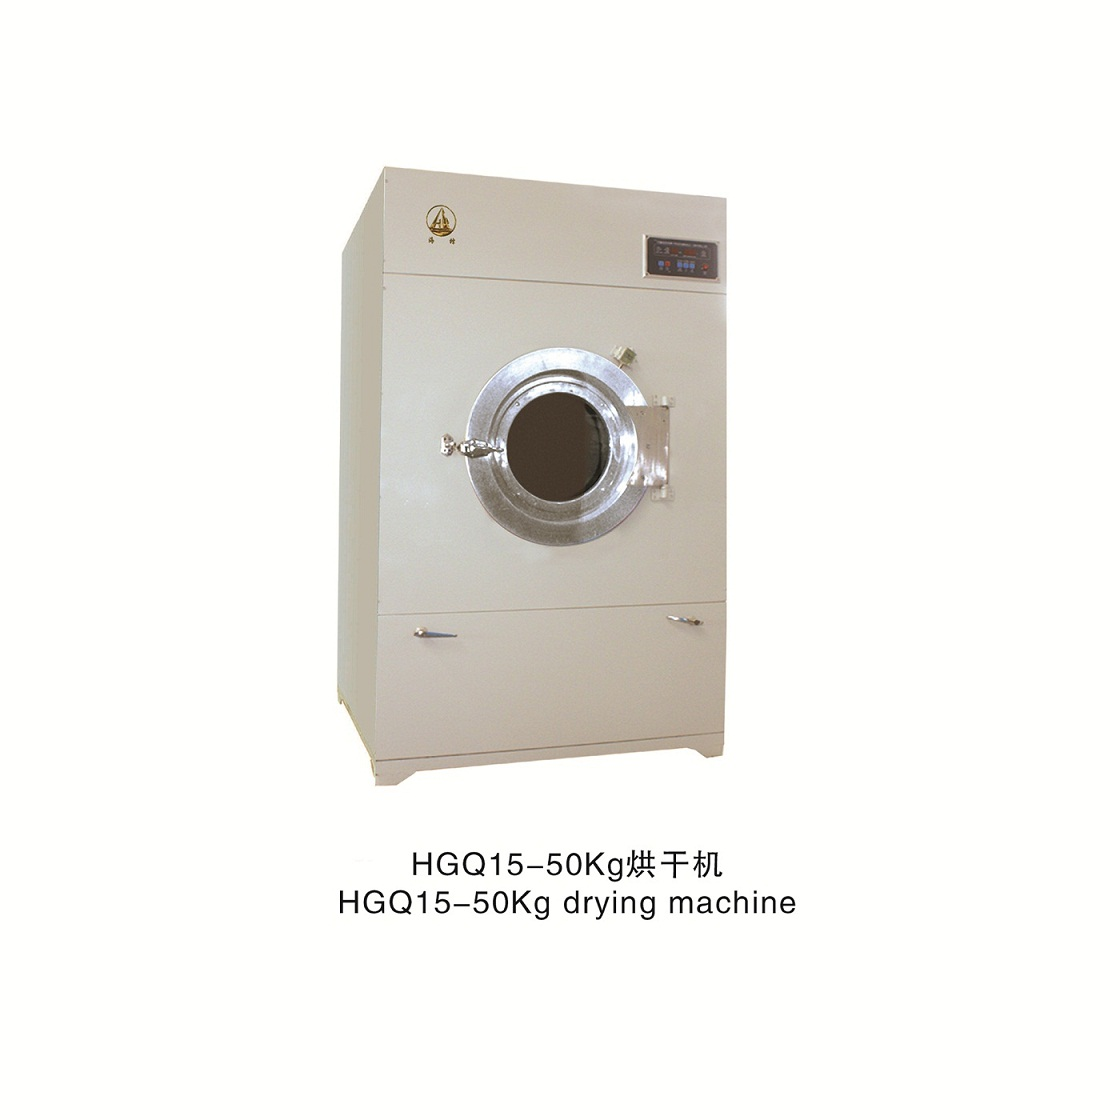 Dryer On A Tumbler ~ Tumbler dryer kgs buy laundry machine drying